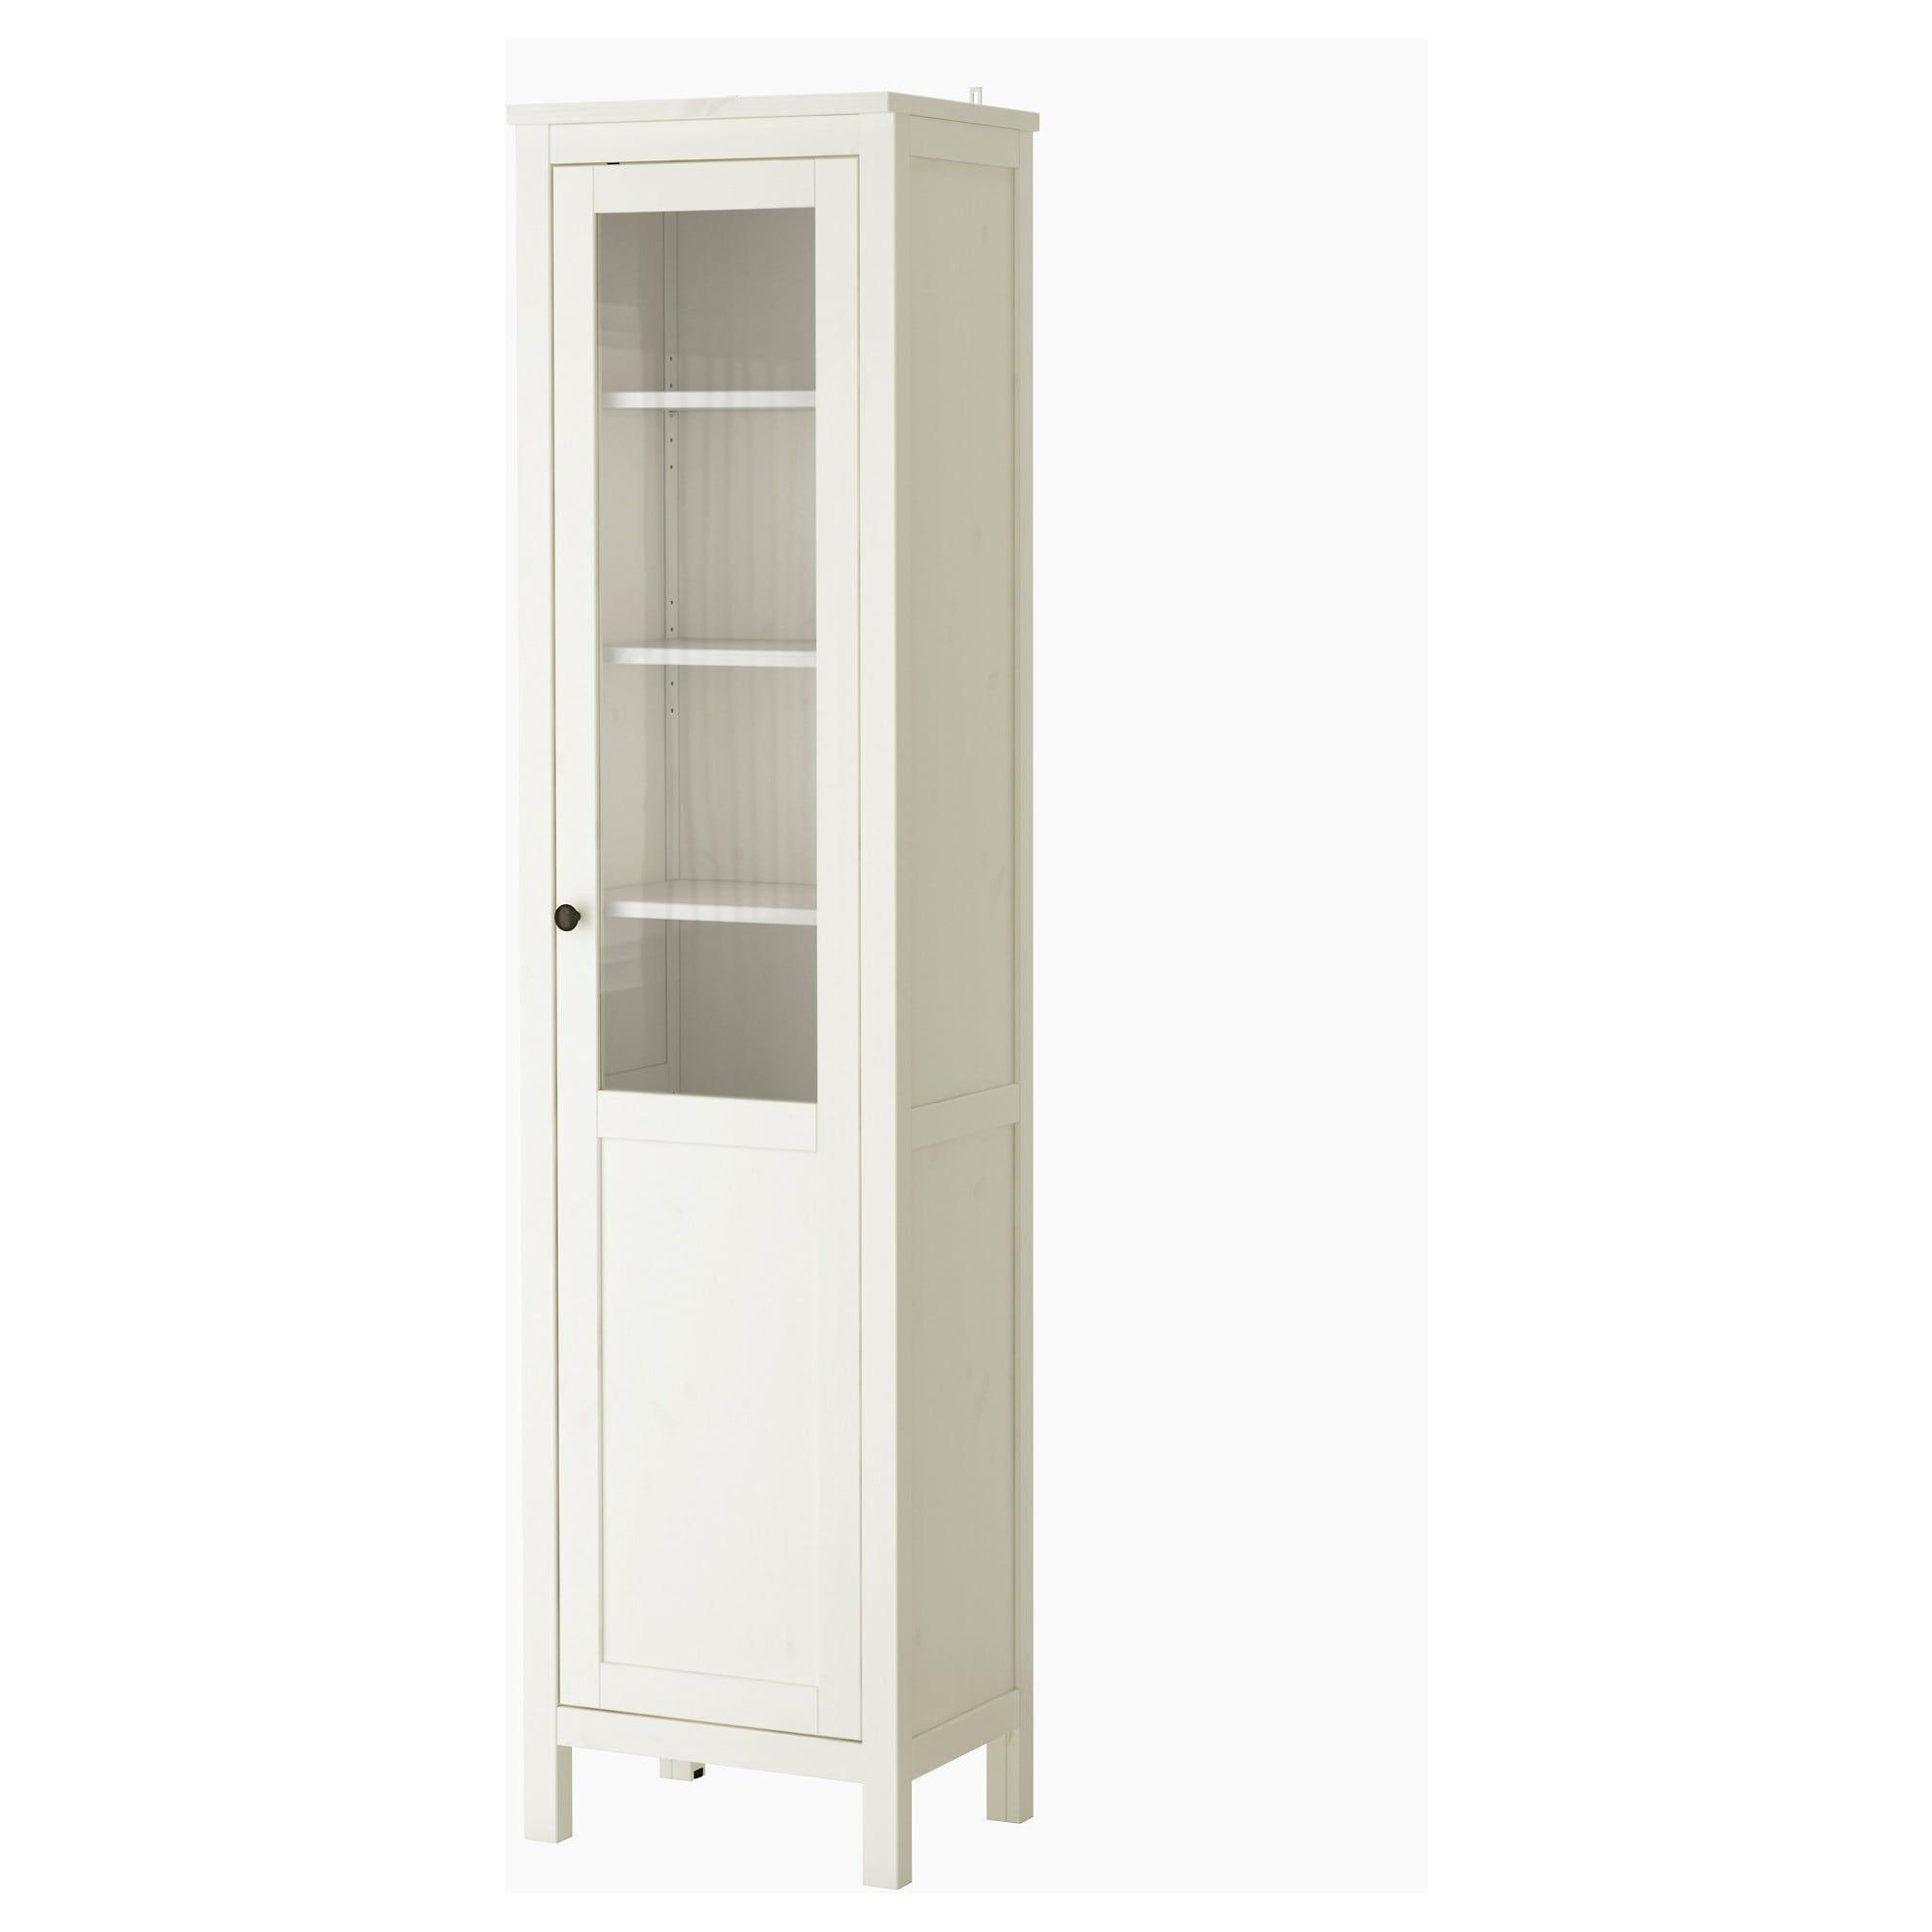 Ikea Us Furniture And Home Furnishings Hemnes Ikea Hemnes Ikea Hemnes Cabinet